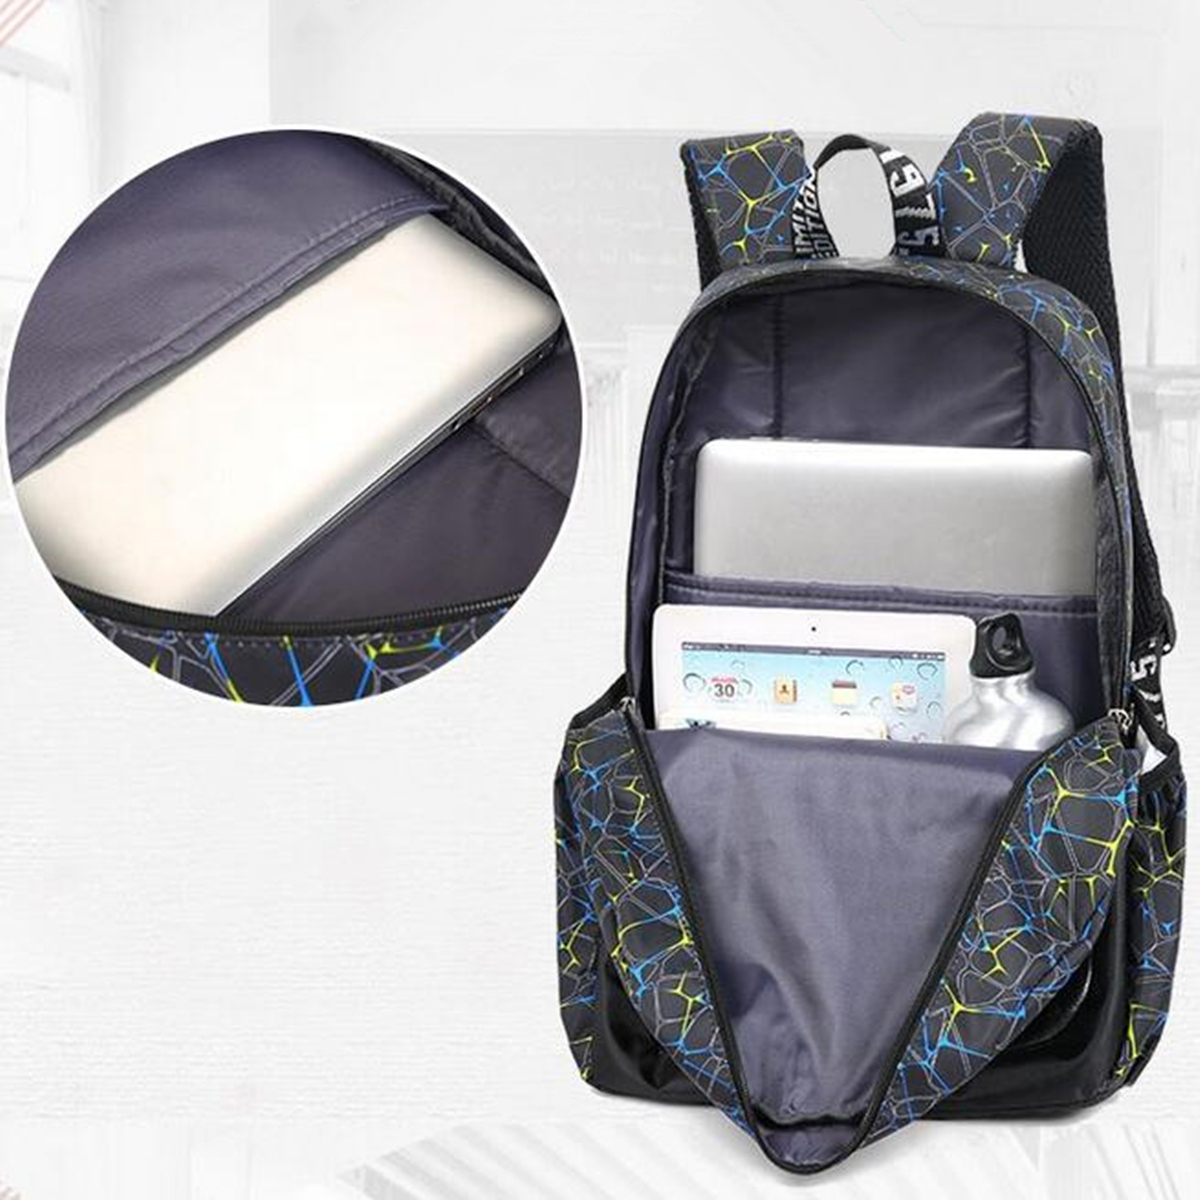 Meigar - Meigar 3pcs set Kids Backpack School Bags Student Travel Shoulder  Pencil Bag - Walmart.com 01605c48e19e9